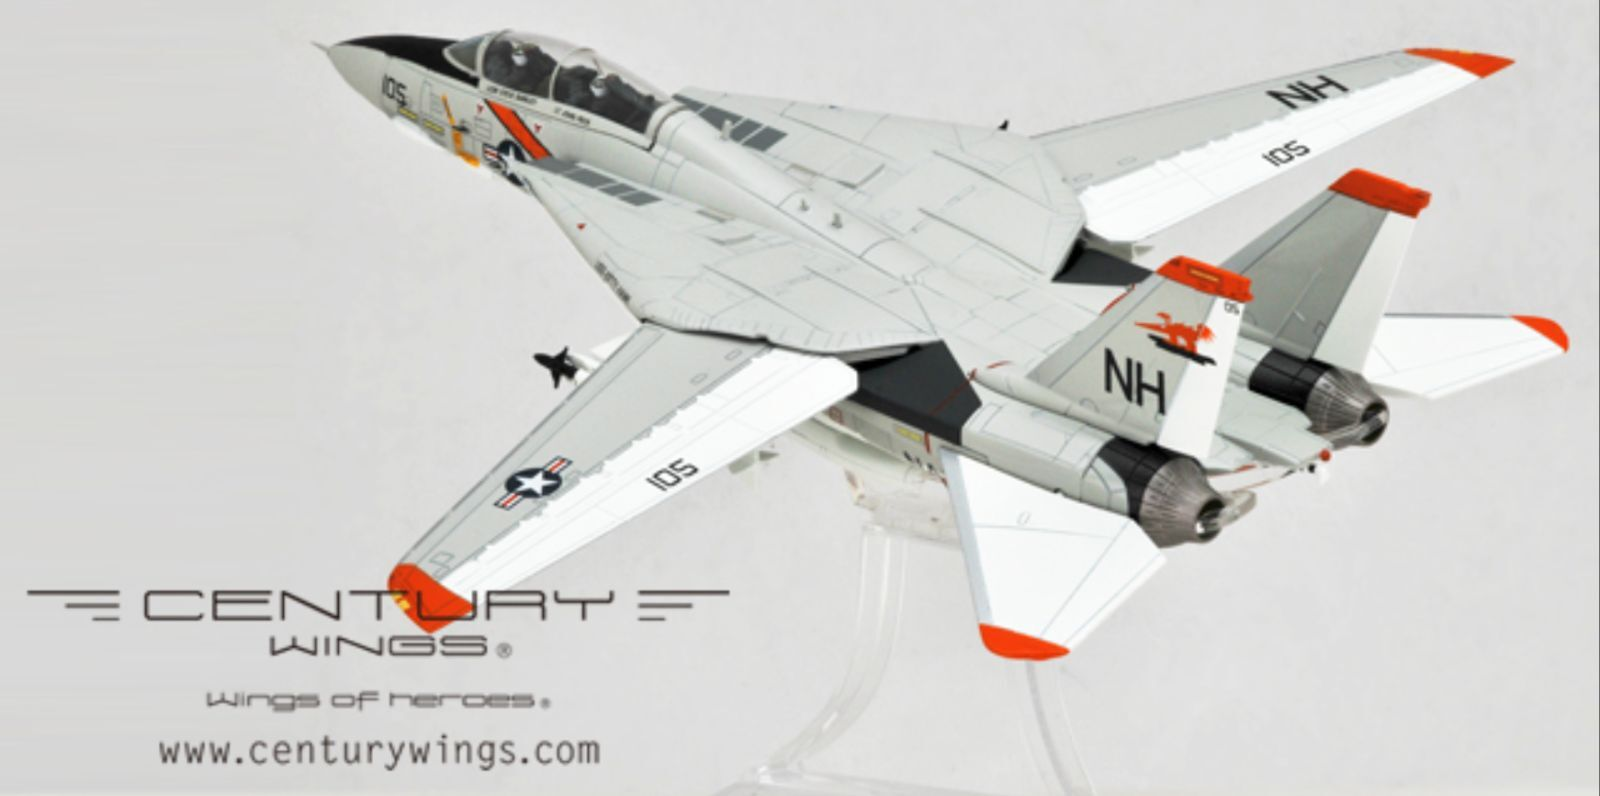 Century Wings 001618 F-14A F-14 Tomcat VF-114 Aardvarks NH105 1978